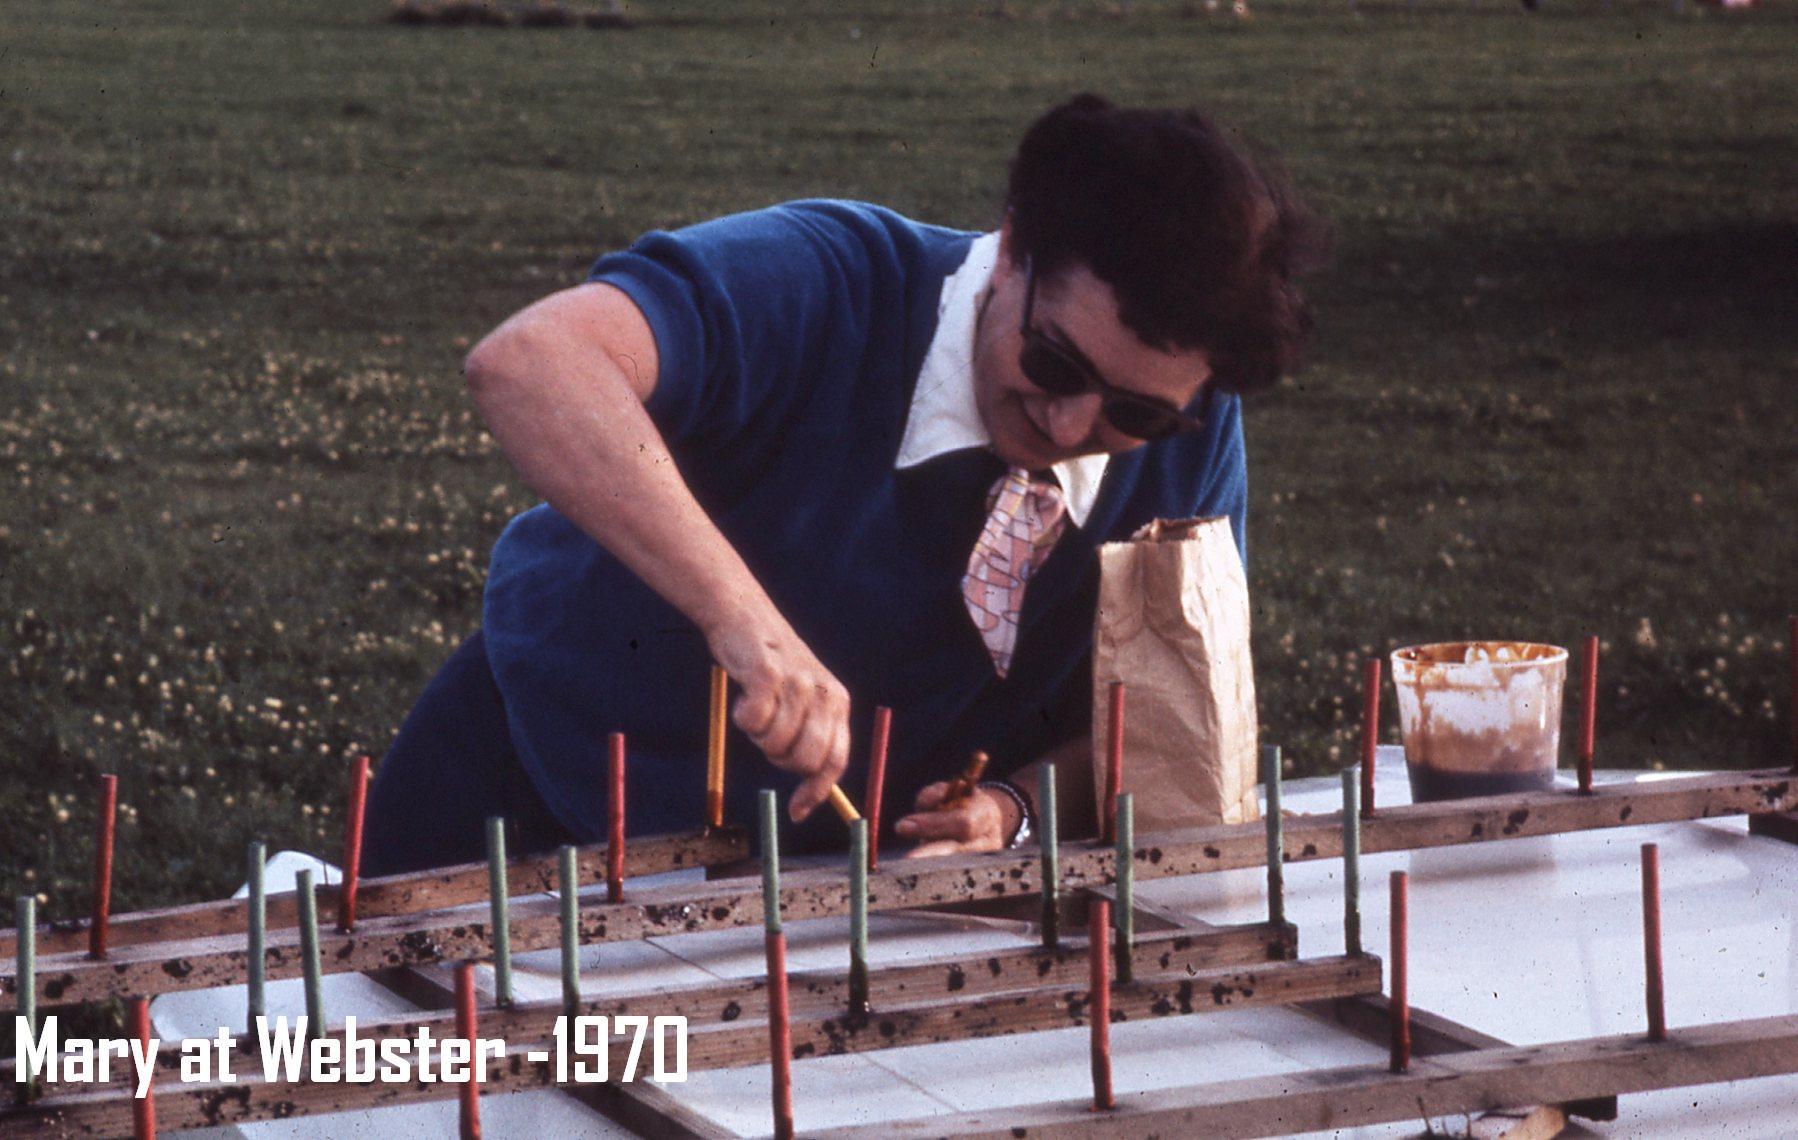 woman assembling fireworks 1970